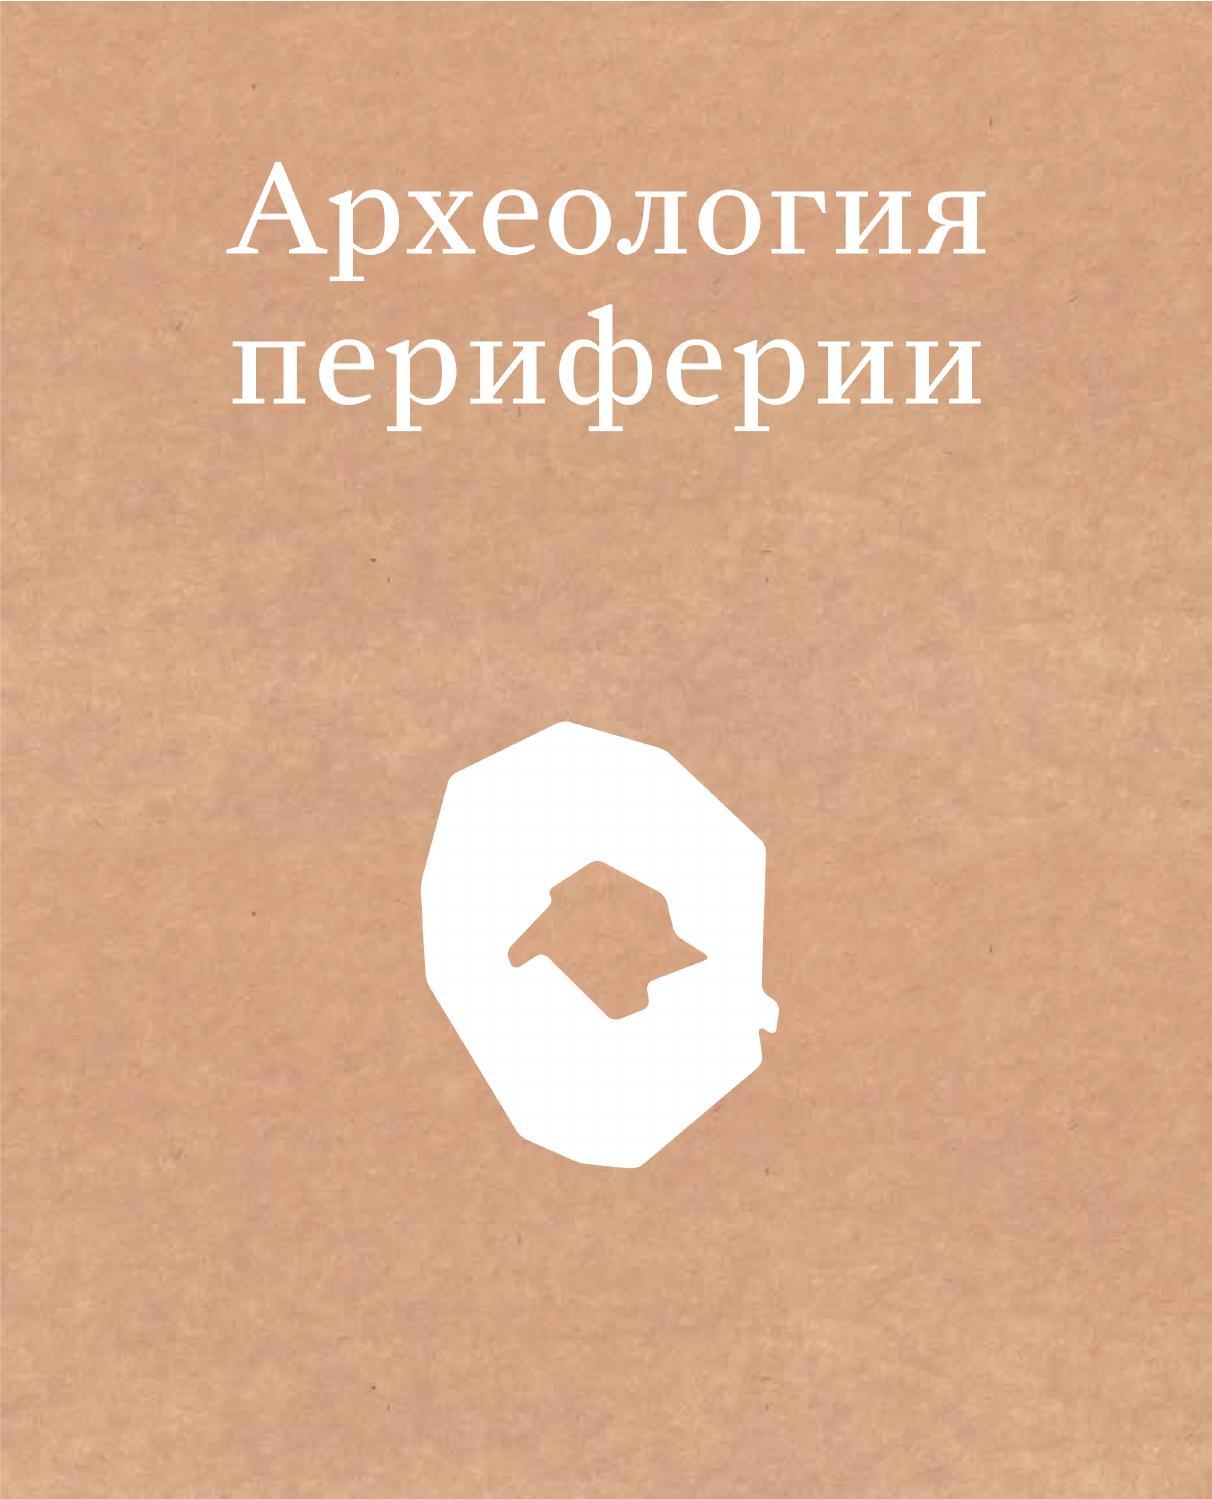 Дишови шлухи за 1000 рублей